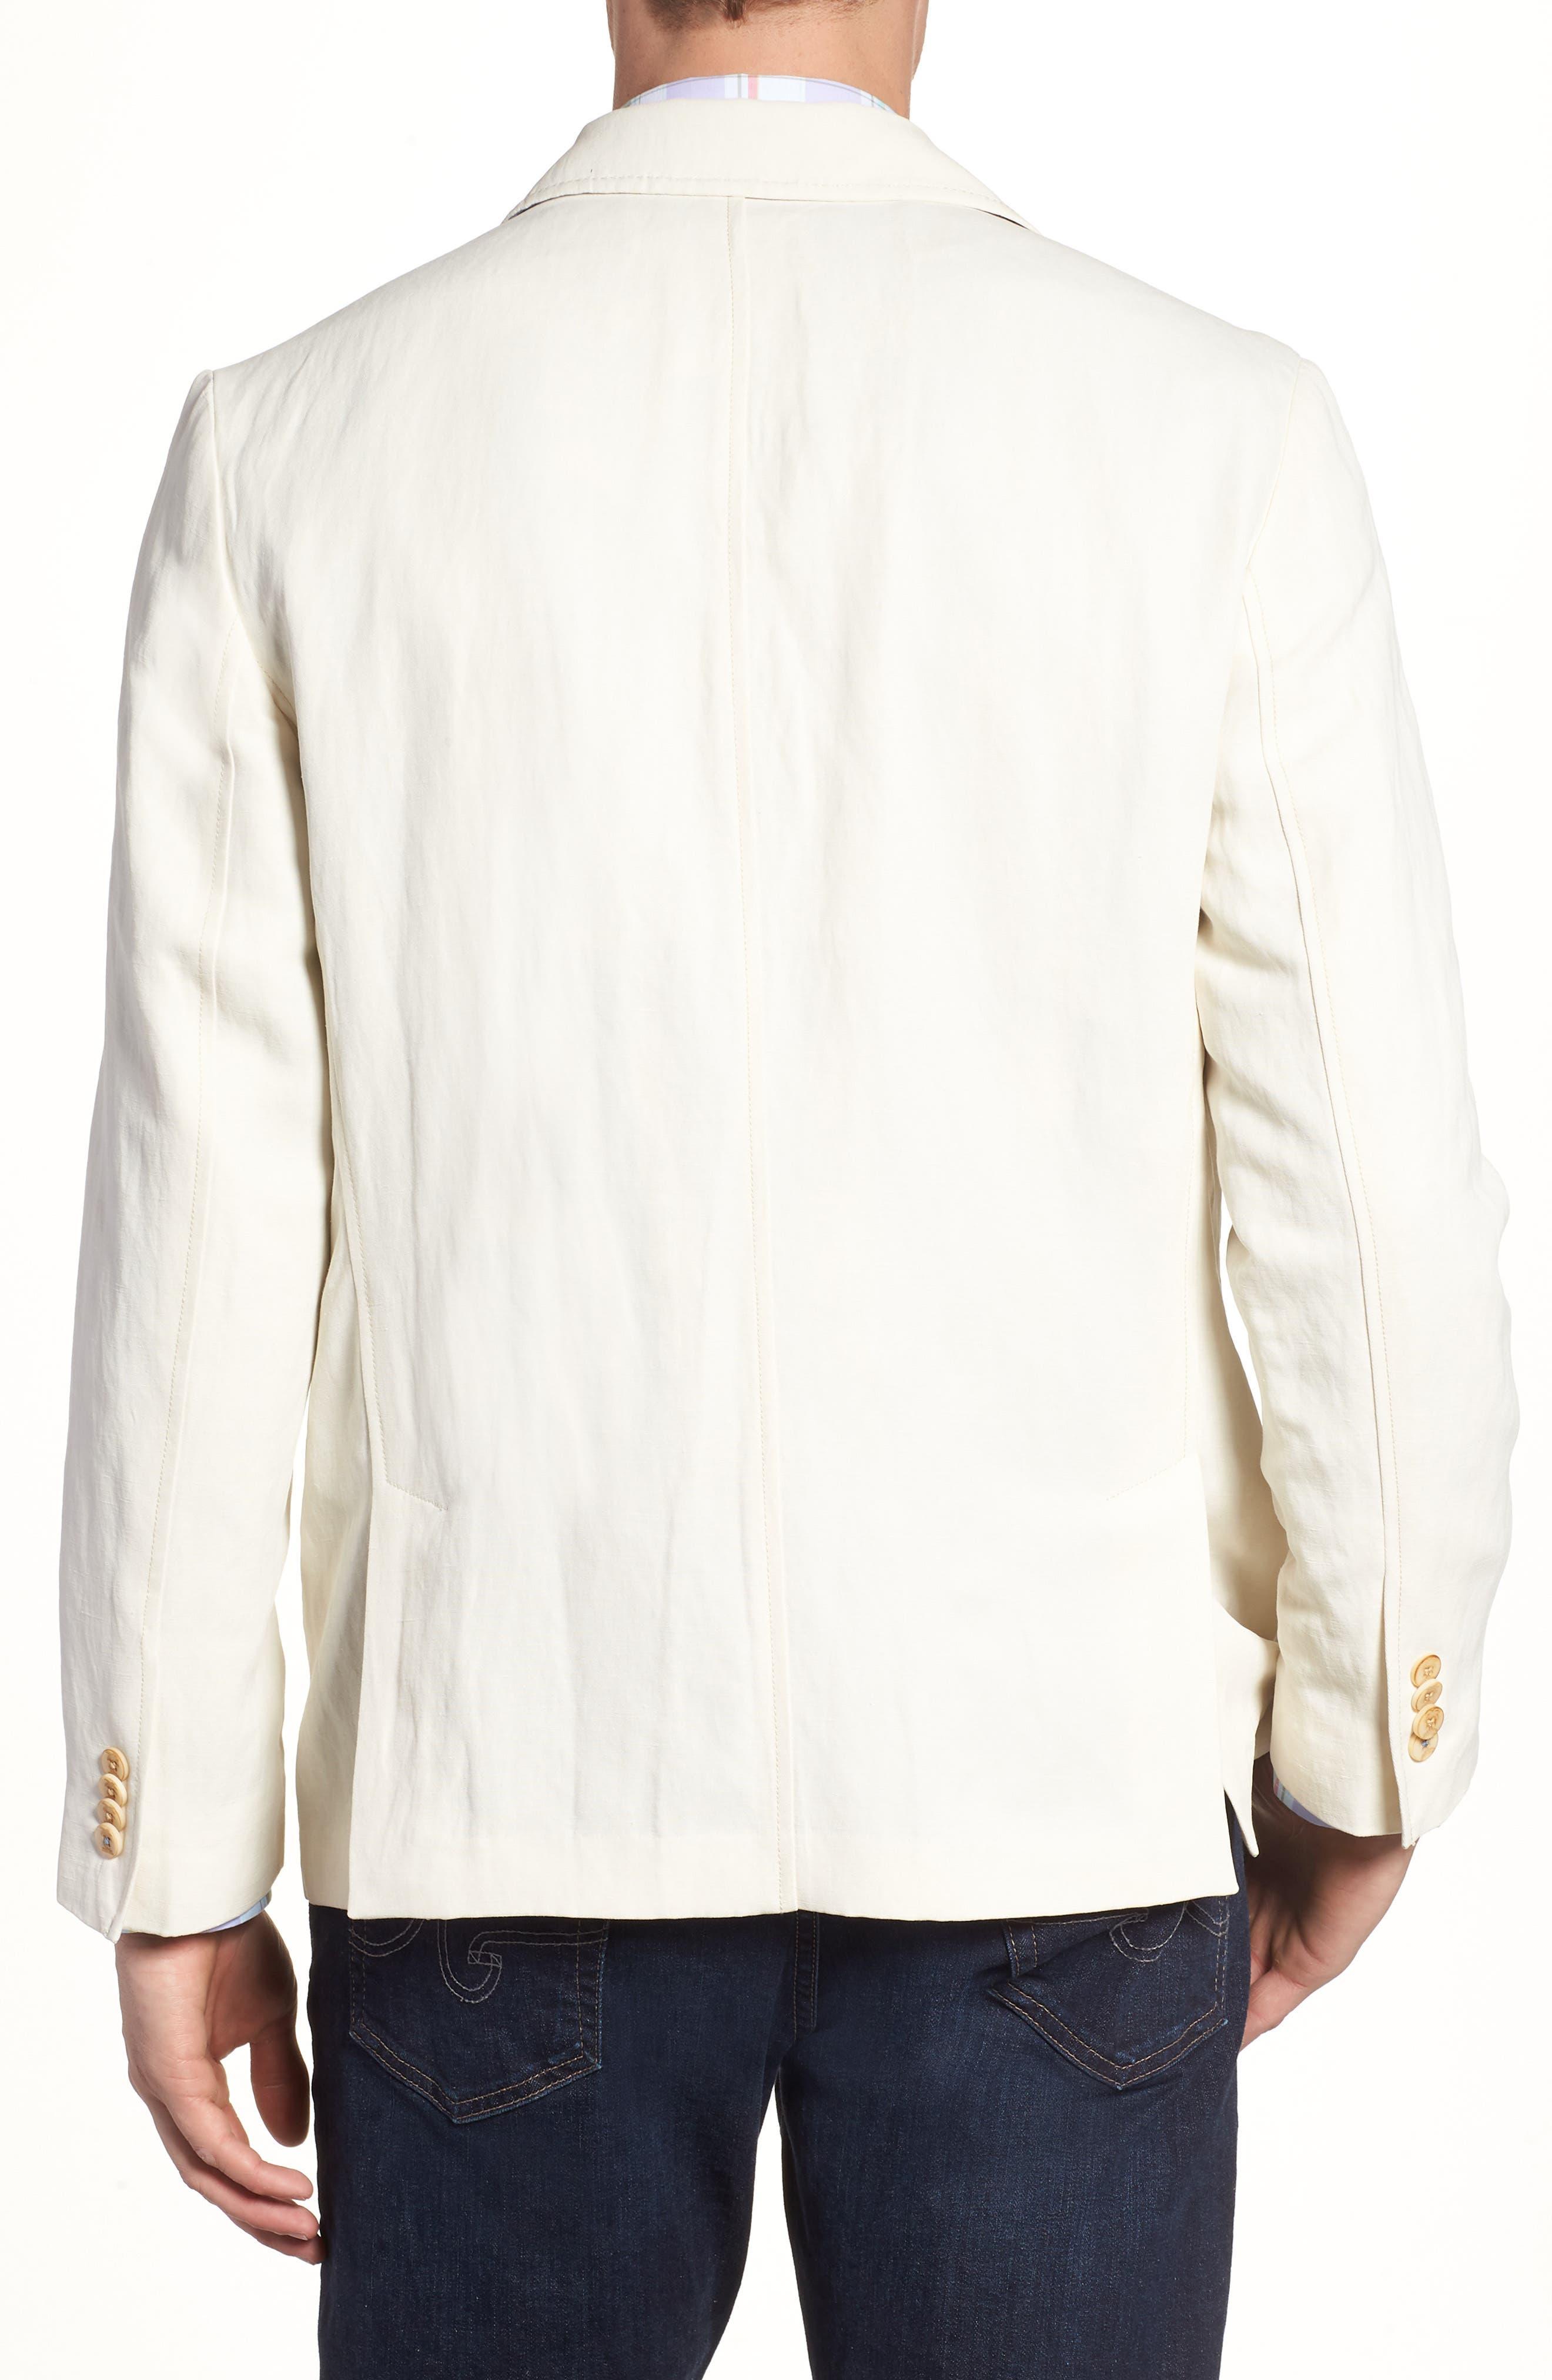 TOMMY BAHAMA,                             Monterey Silk & Linen Blazer,                             Alternate thumbnail 2, color,                             WARM SAND